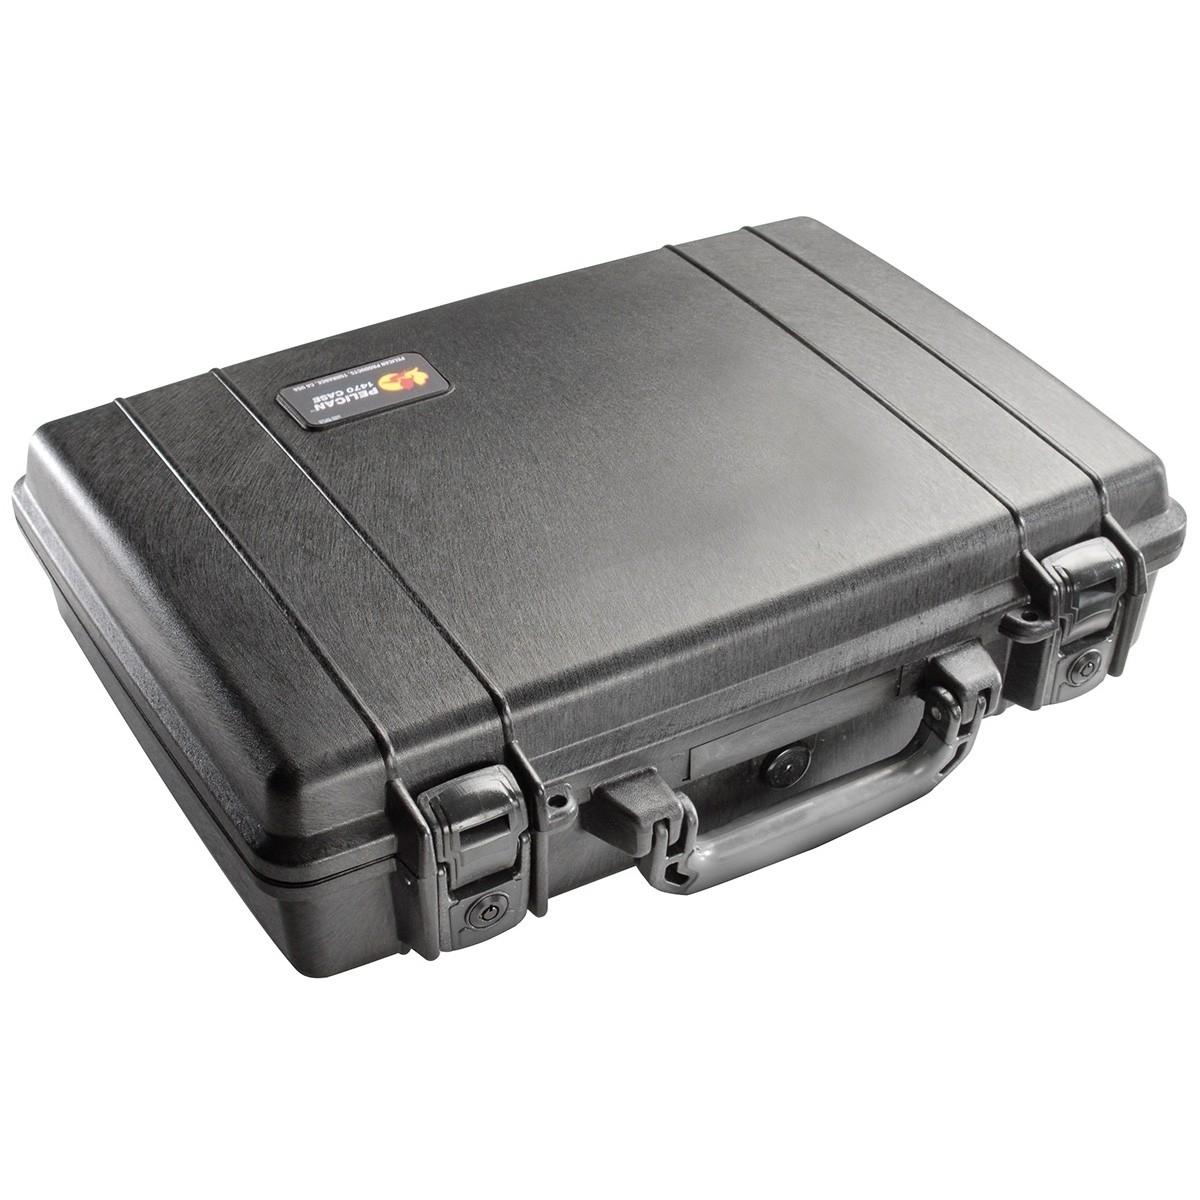 Pelican 1470 Laptop Carry Case